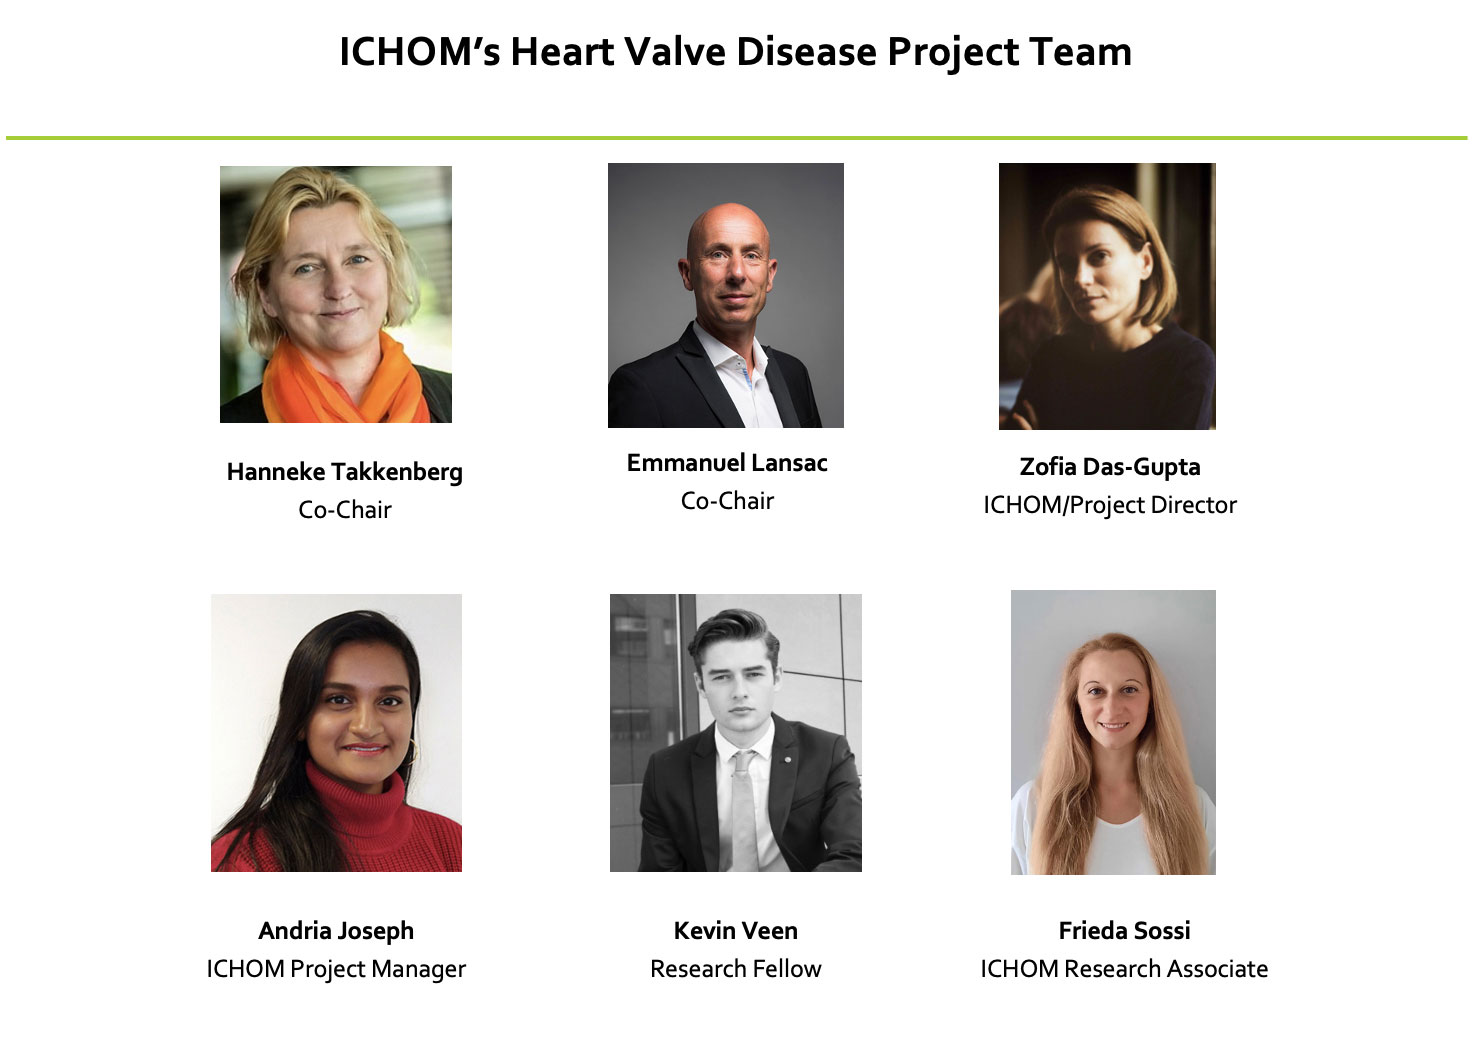 ICHOM Standard Sets Heart Valve Disease Project Team